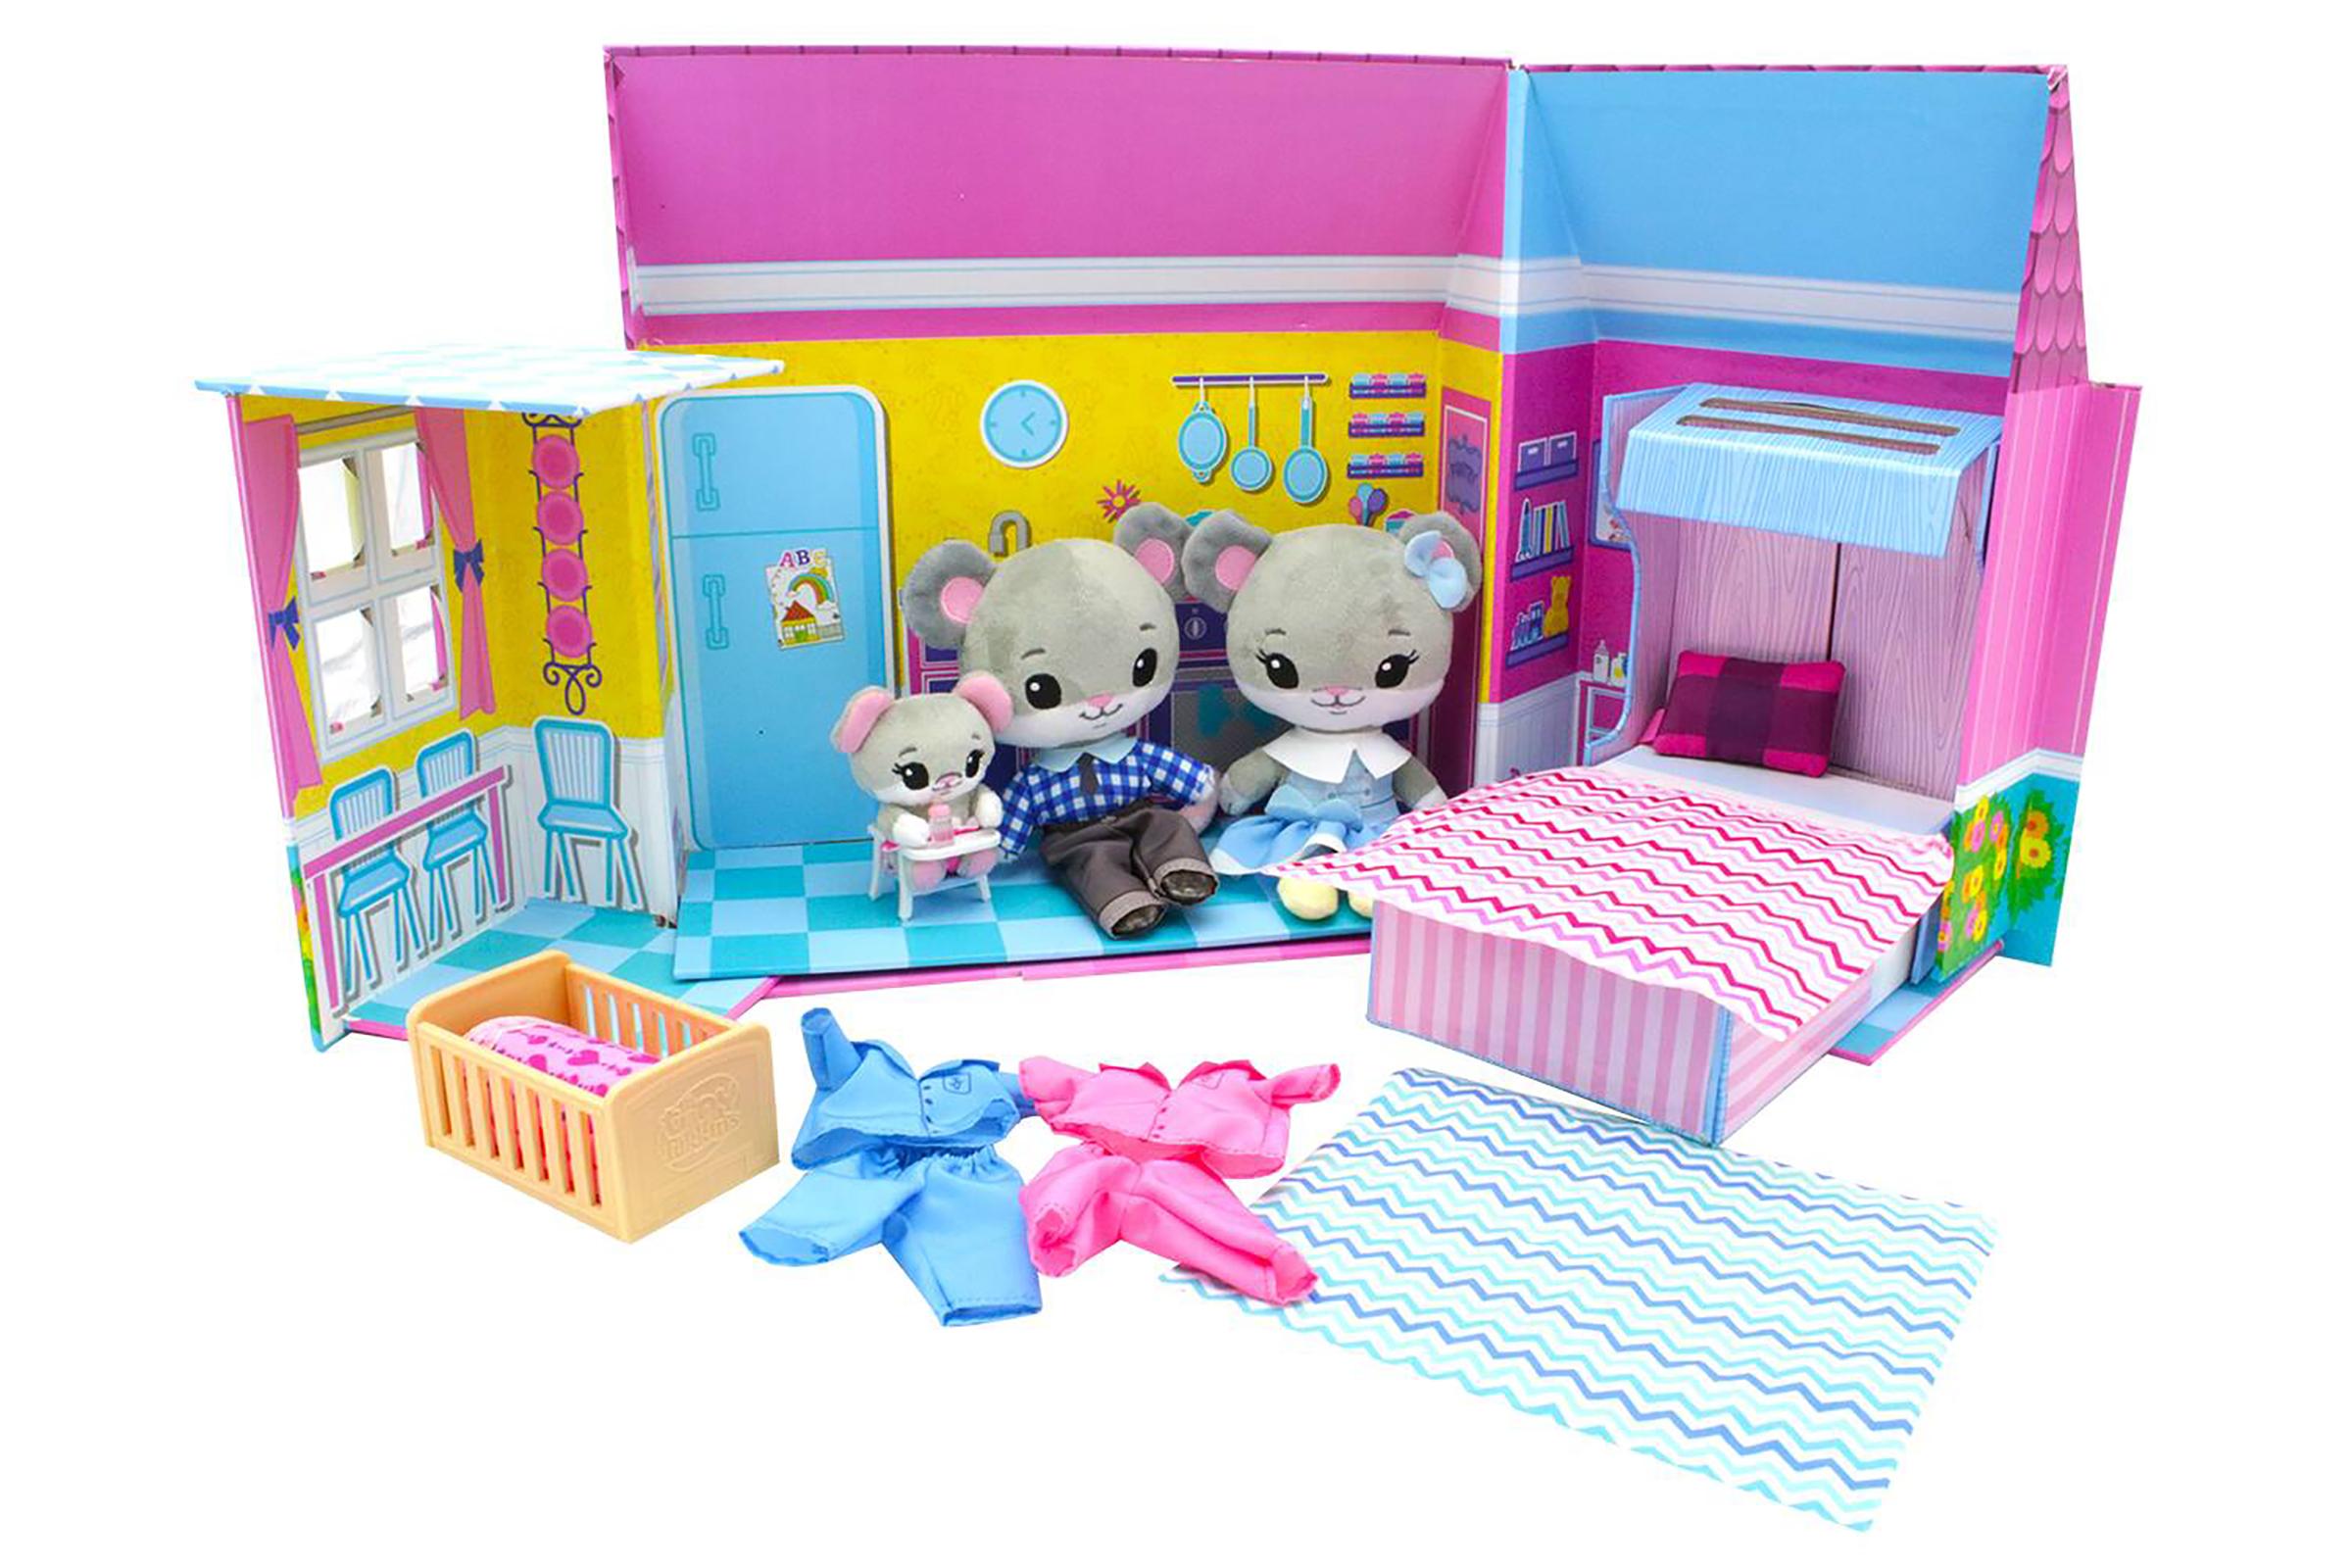 Tiny Tukkins Kids' Deluxe Plush Play House Set $10 + Free Store Pickup at Walmart